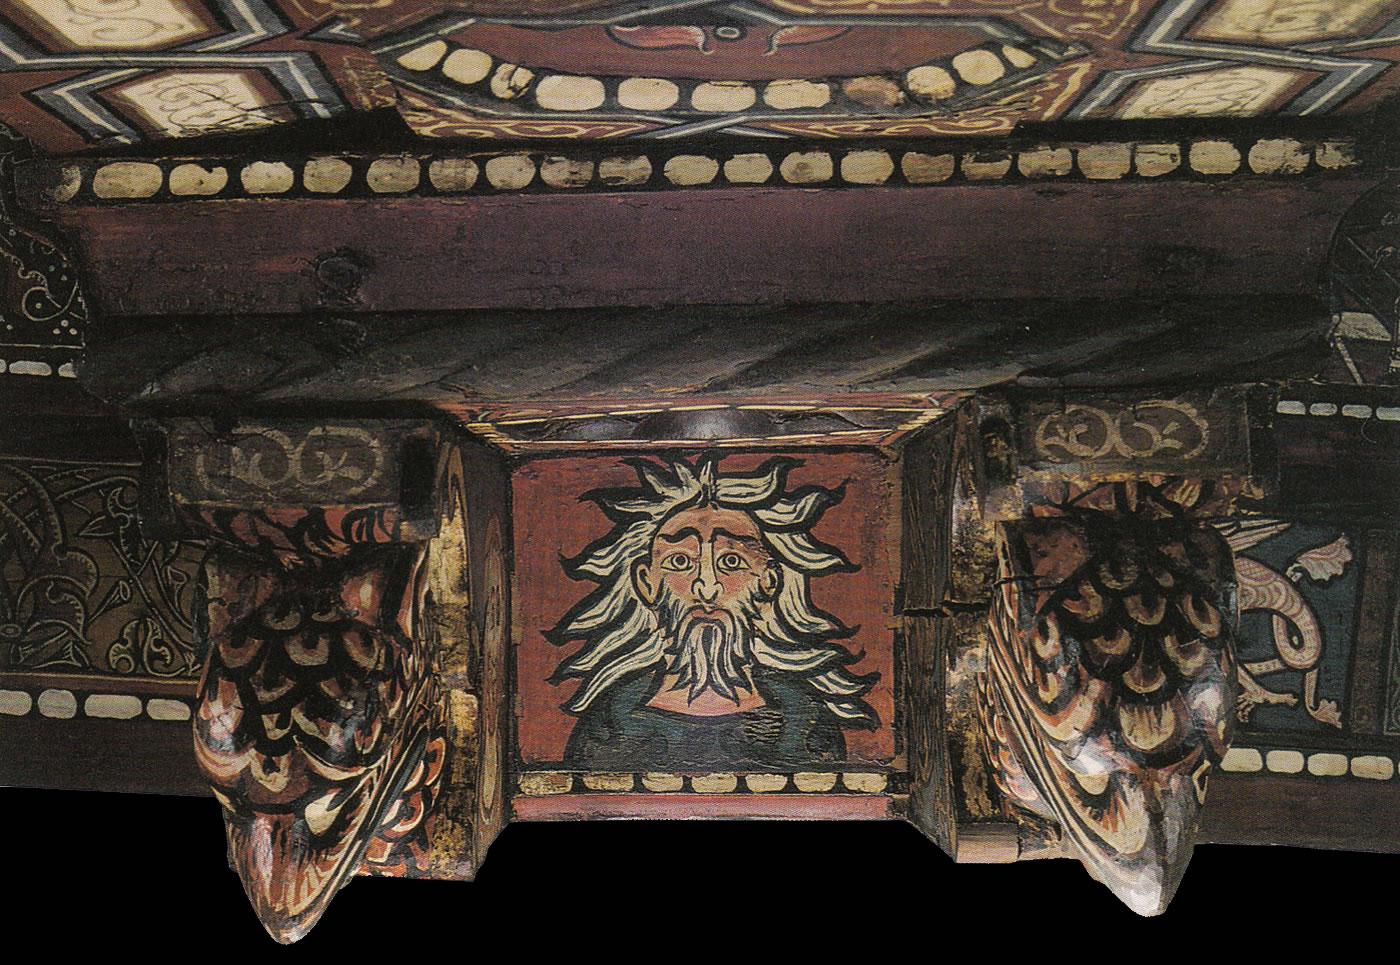 La techumbre de la Catedral de Teruel. Anciano